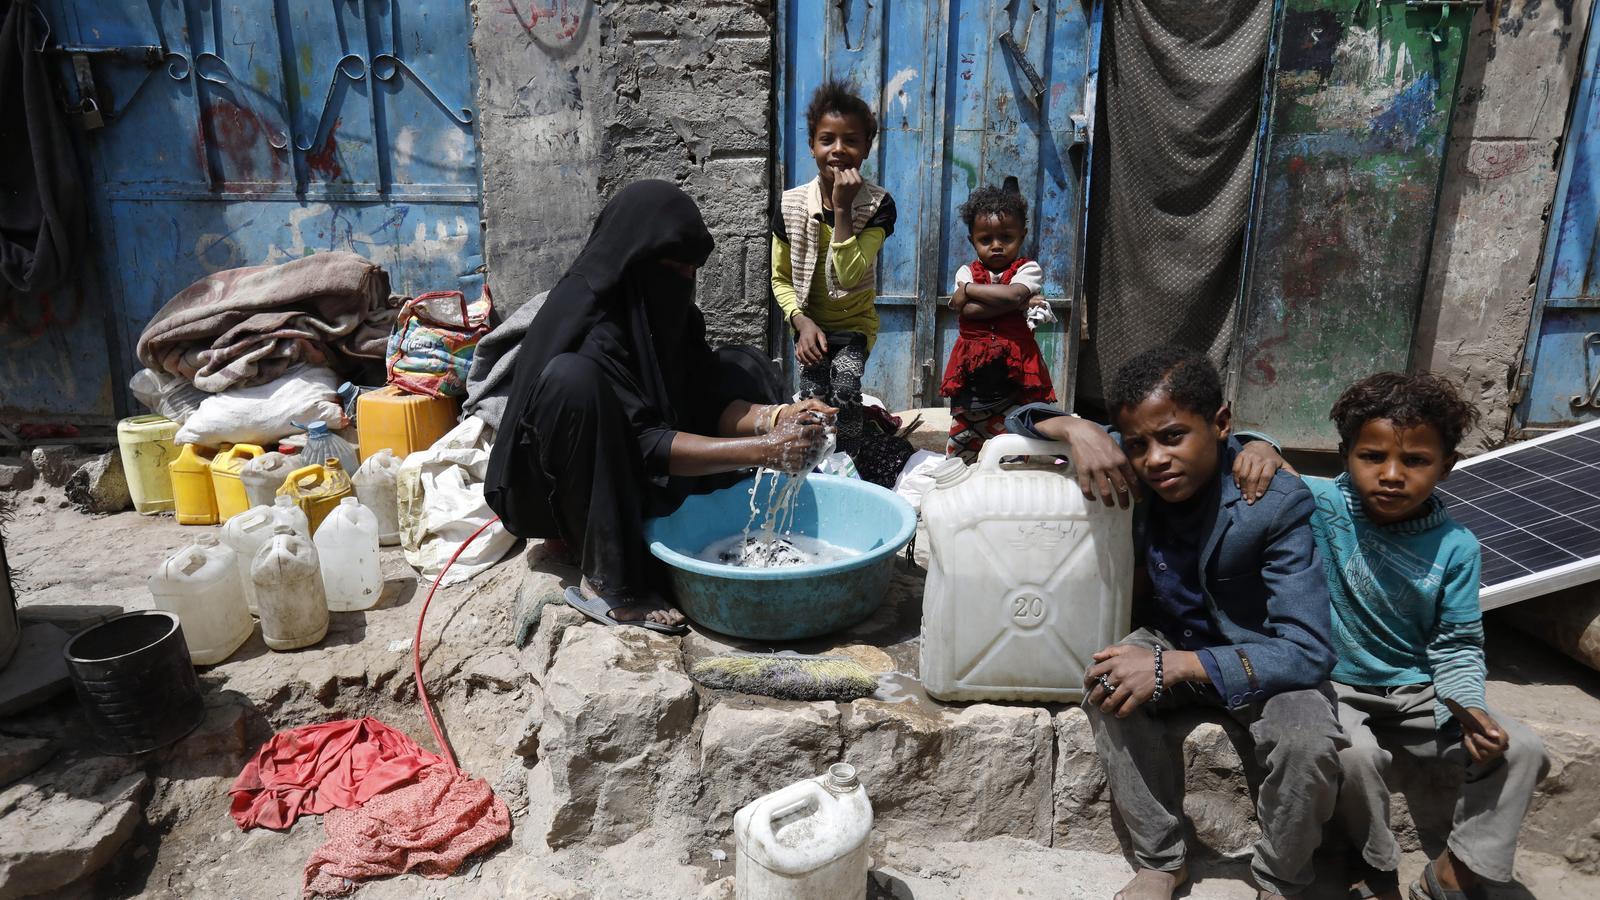 Bombes, fam, epidèmies i desabastiment s'acarnissen al Iemen